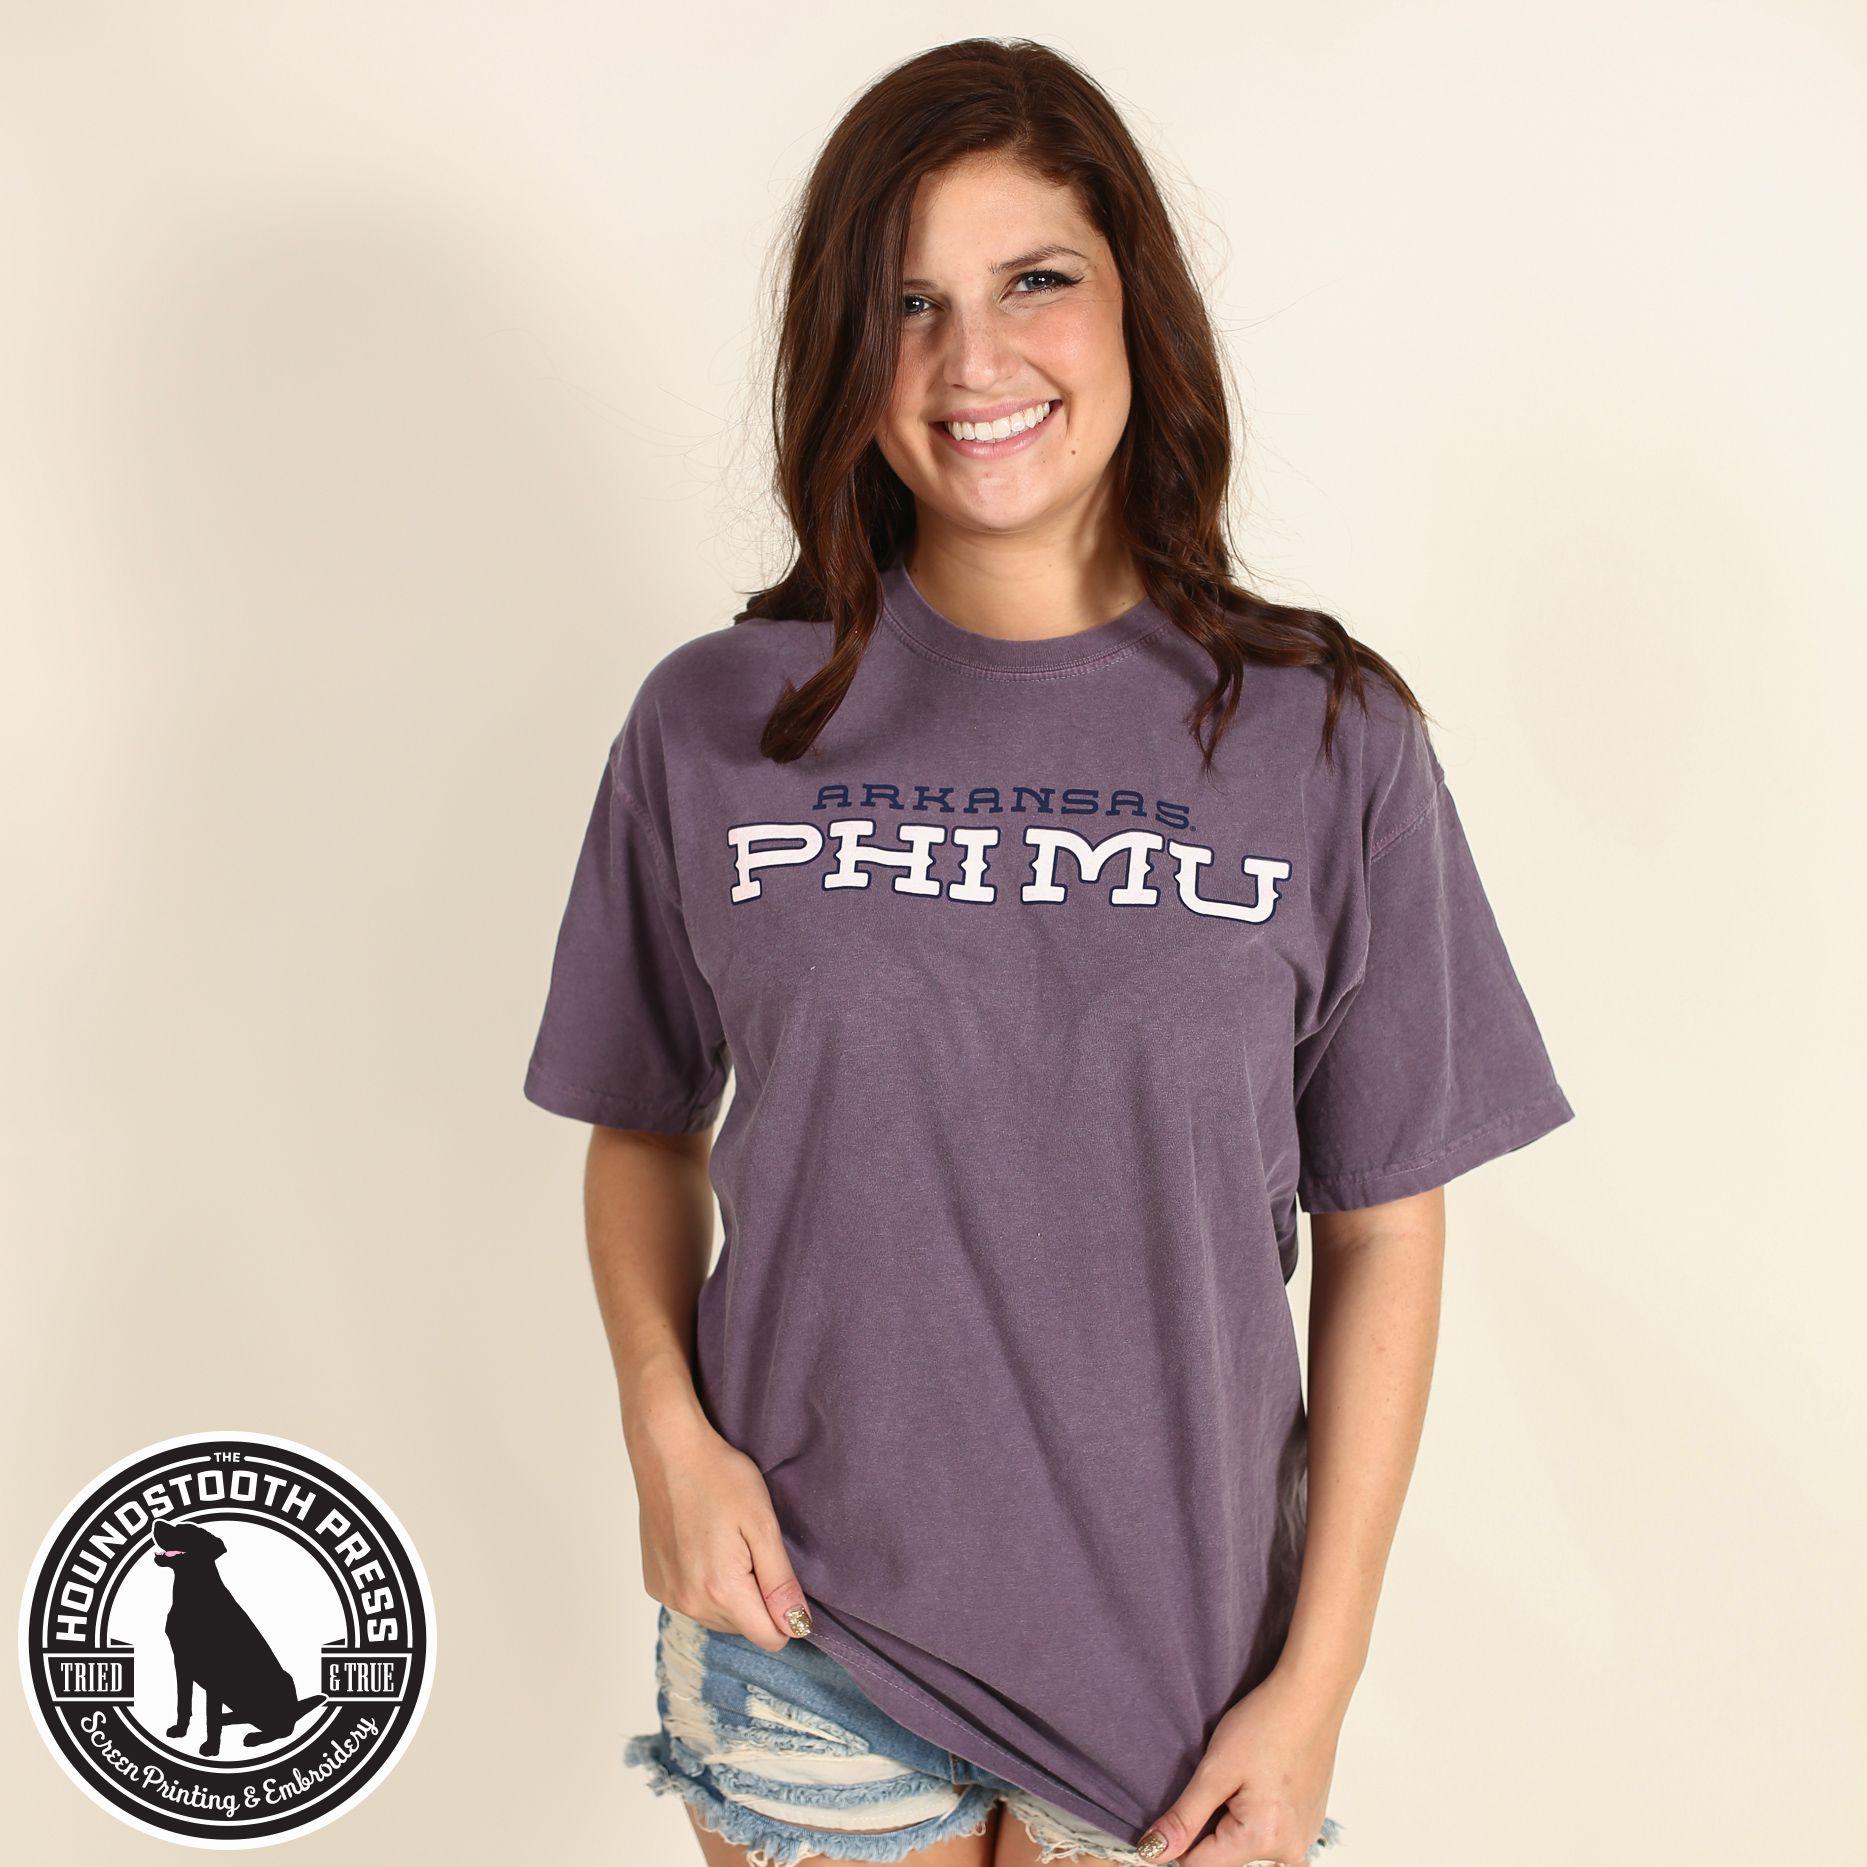 University Of Arkansas Phi Mu Bold Design T Shirt Comfort Colors